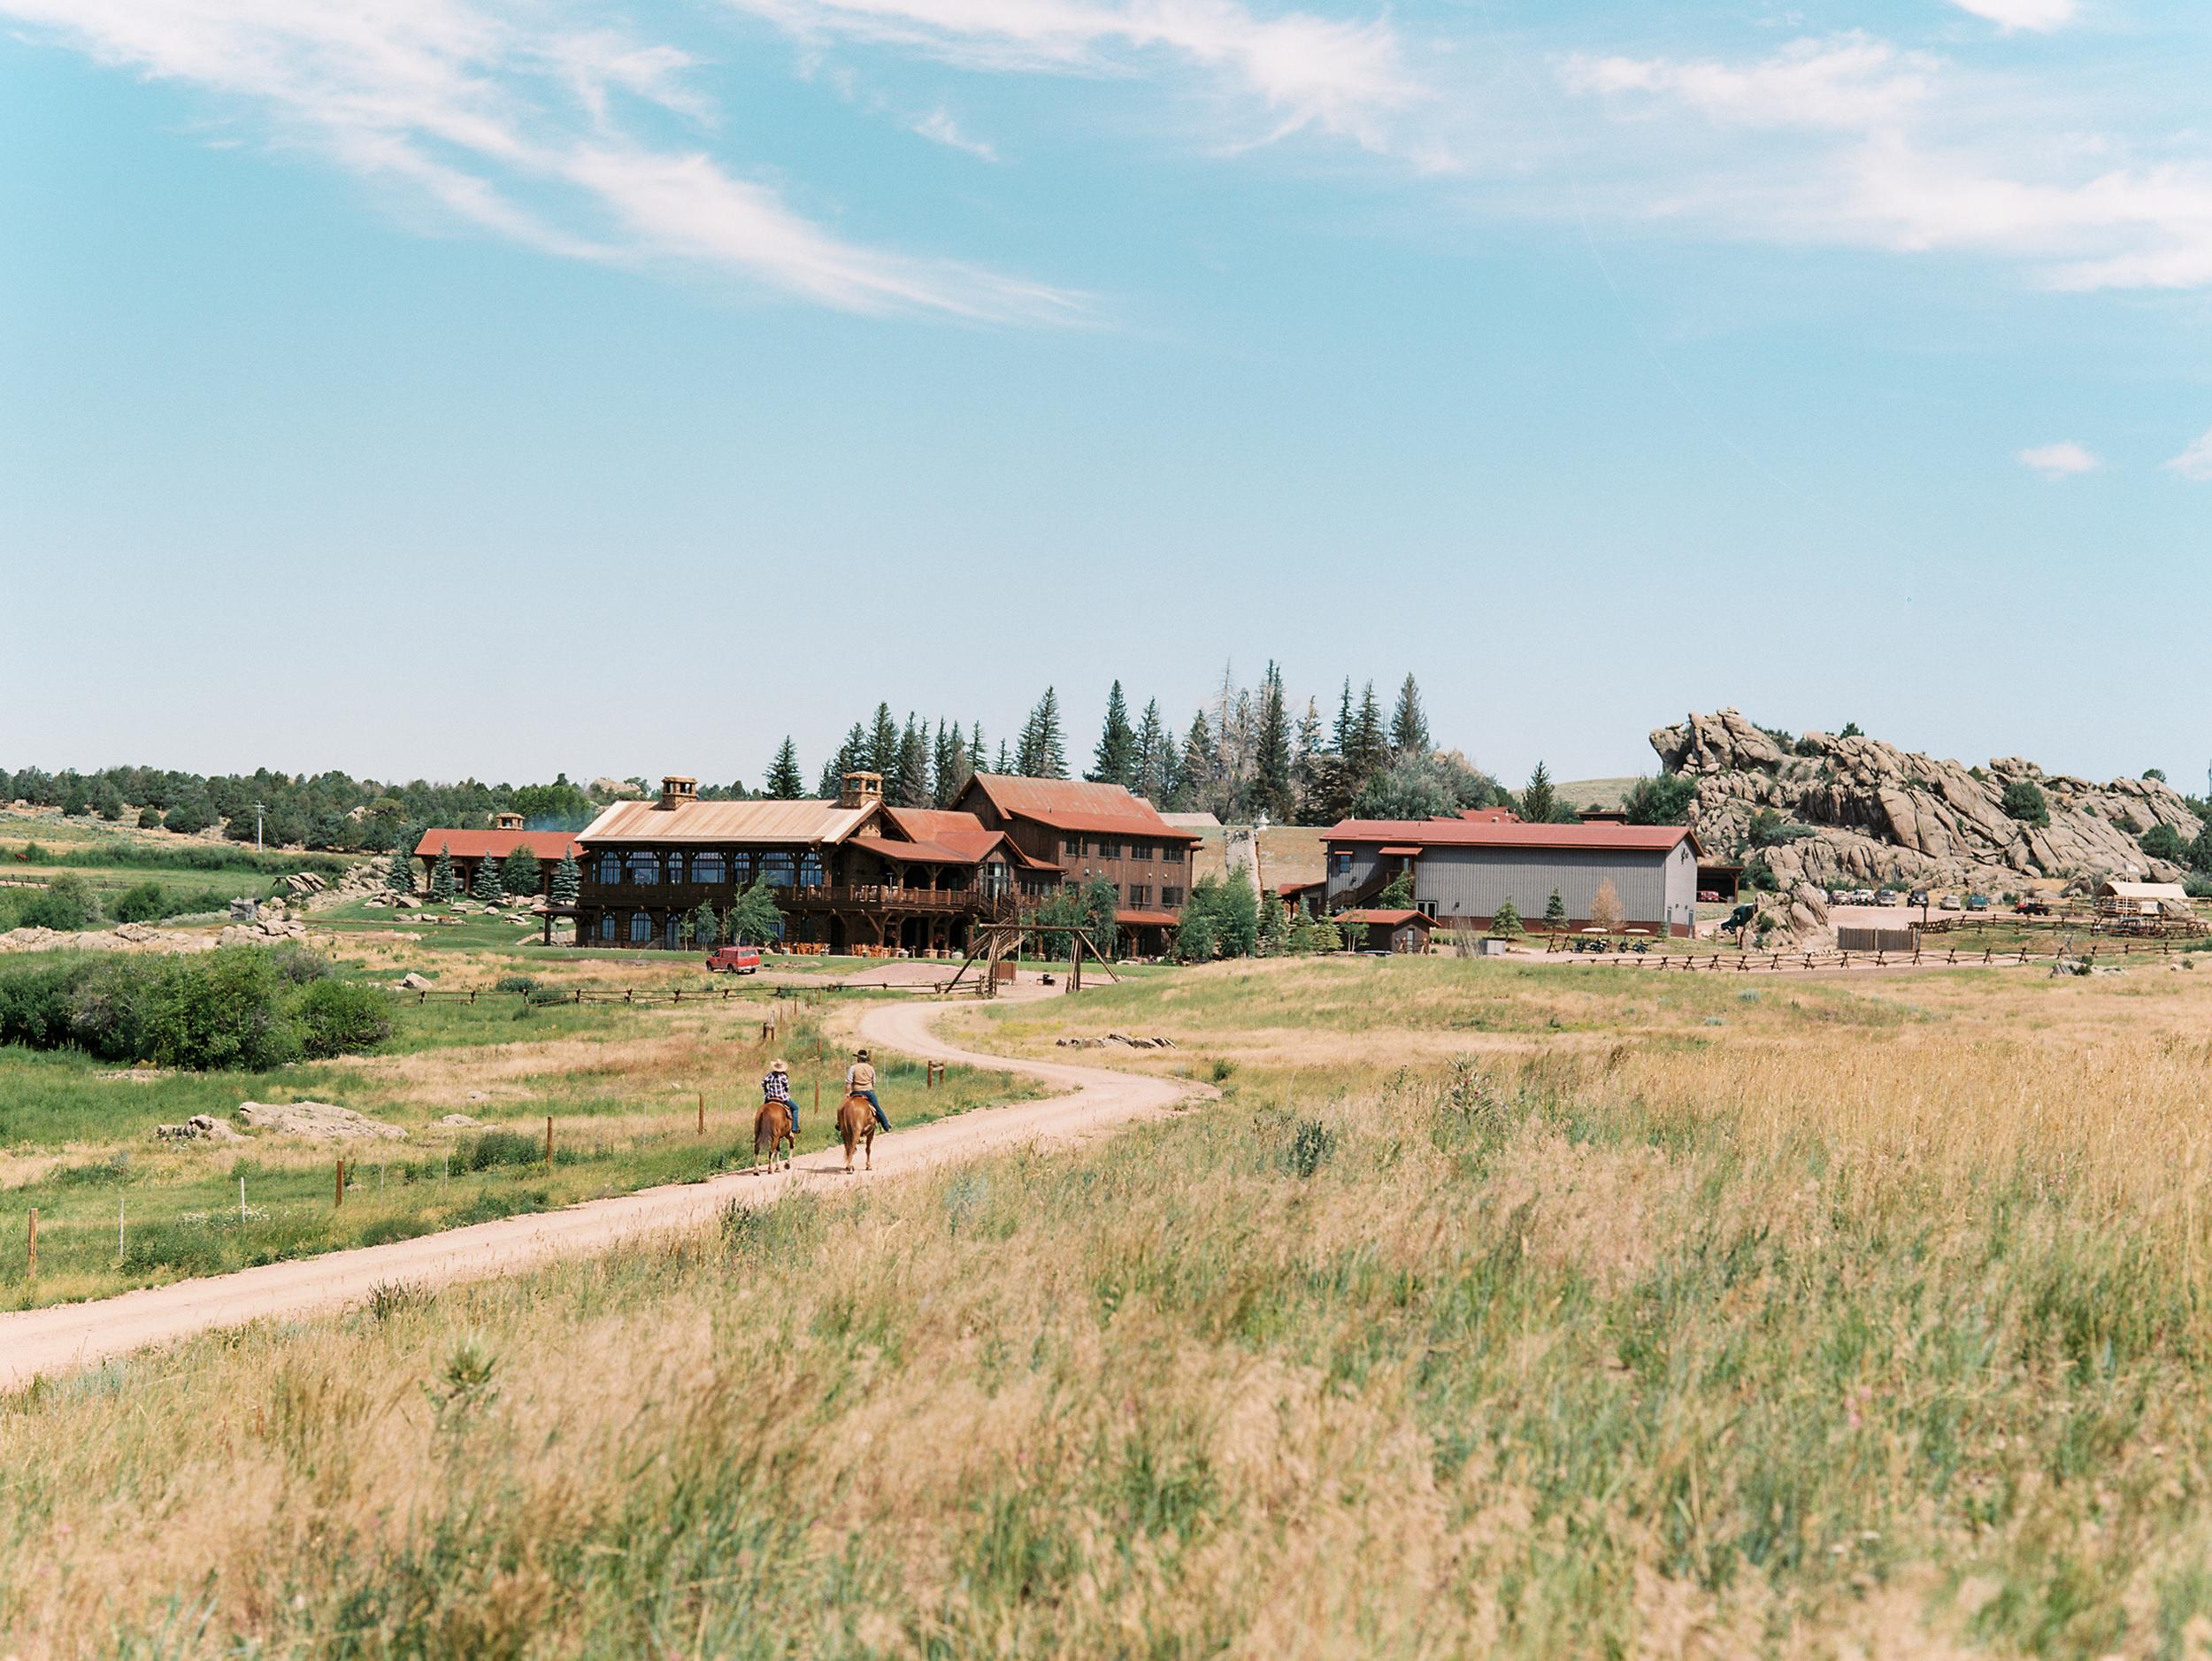 Bohemian Wedding Inspiration at Brush Creek Ranch | Photography: Lisa O'Dwyer